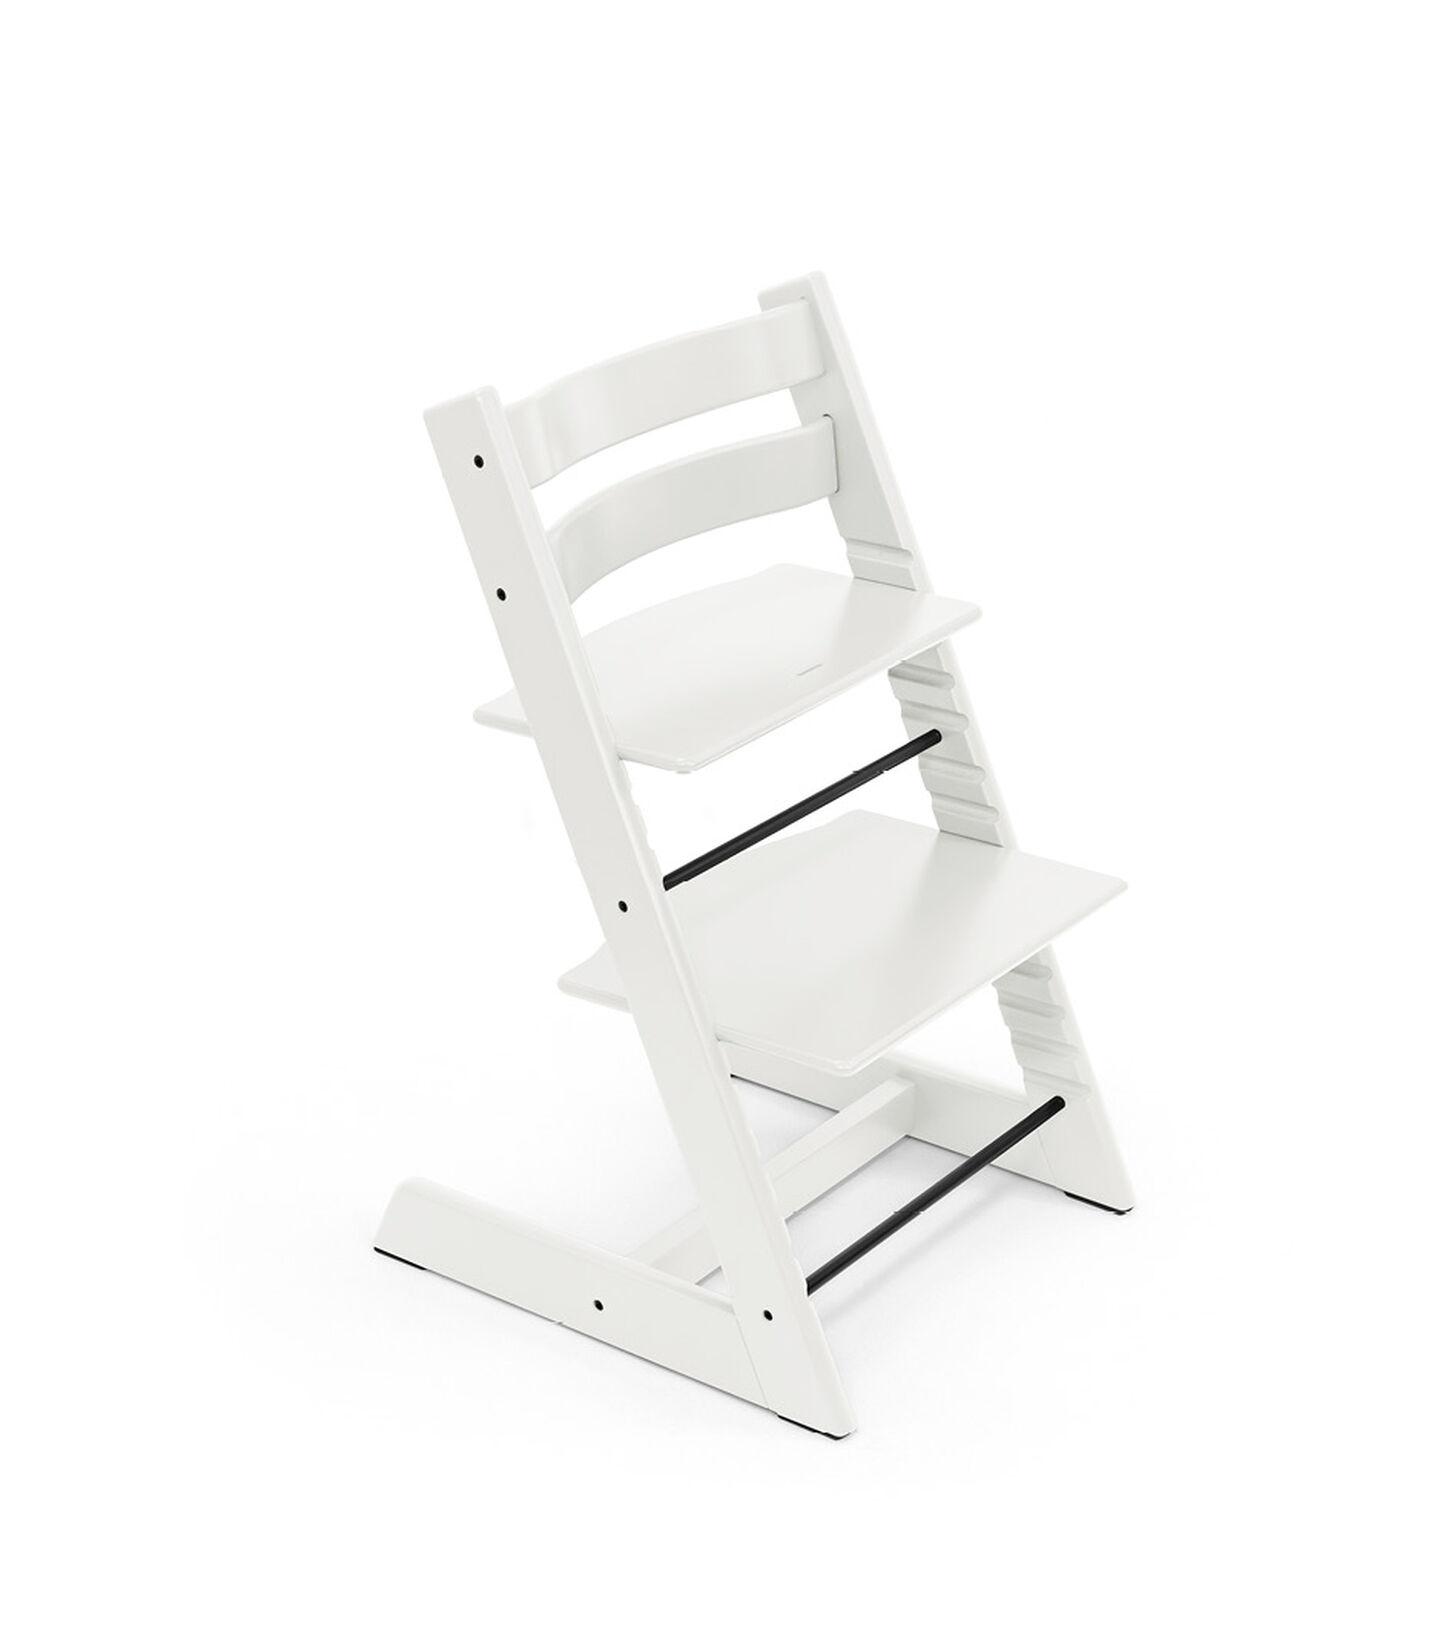 Tripp Trapp® Chair White, White, mainview view 2